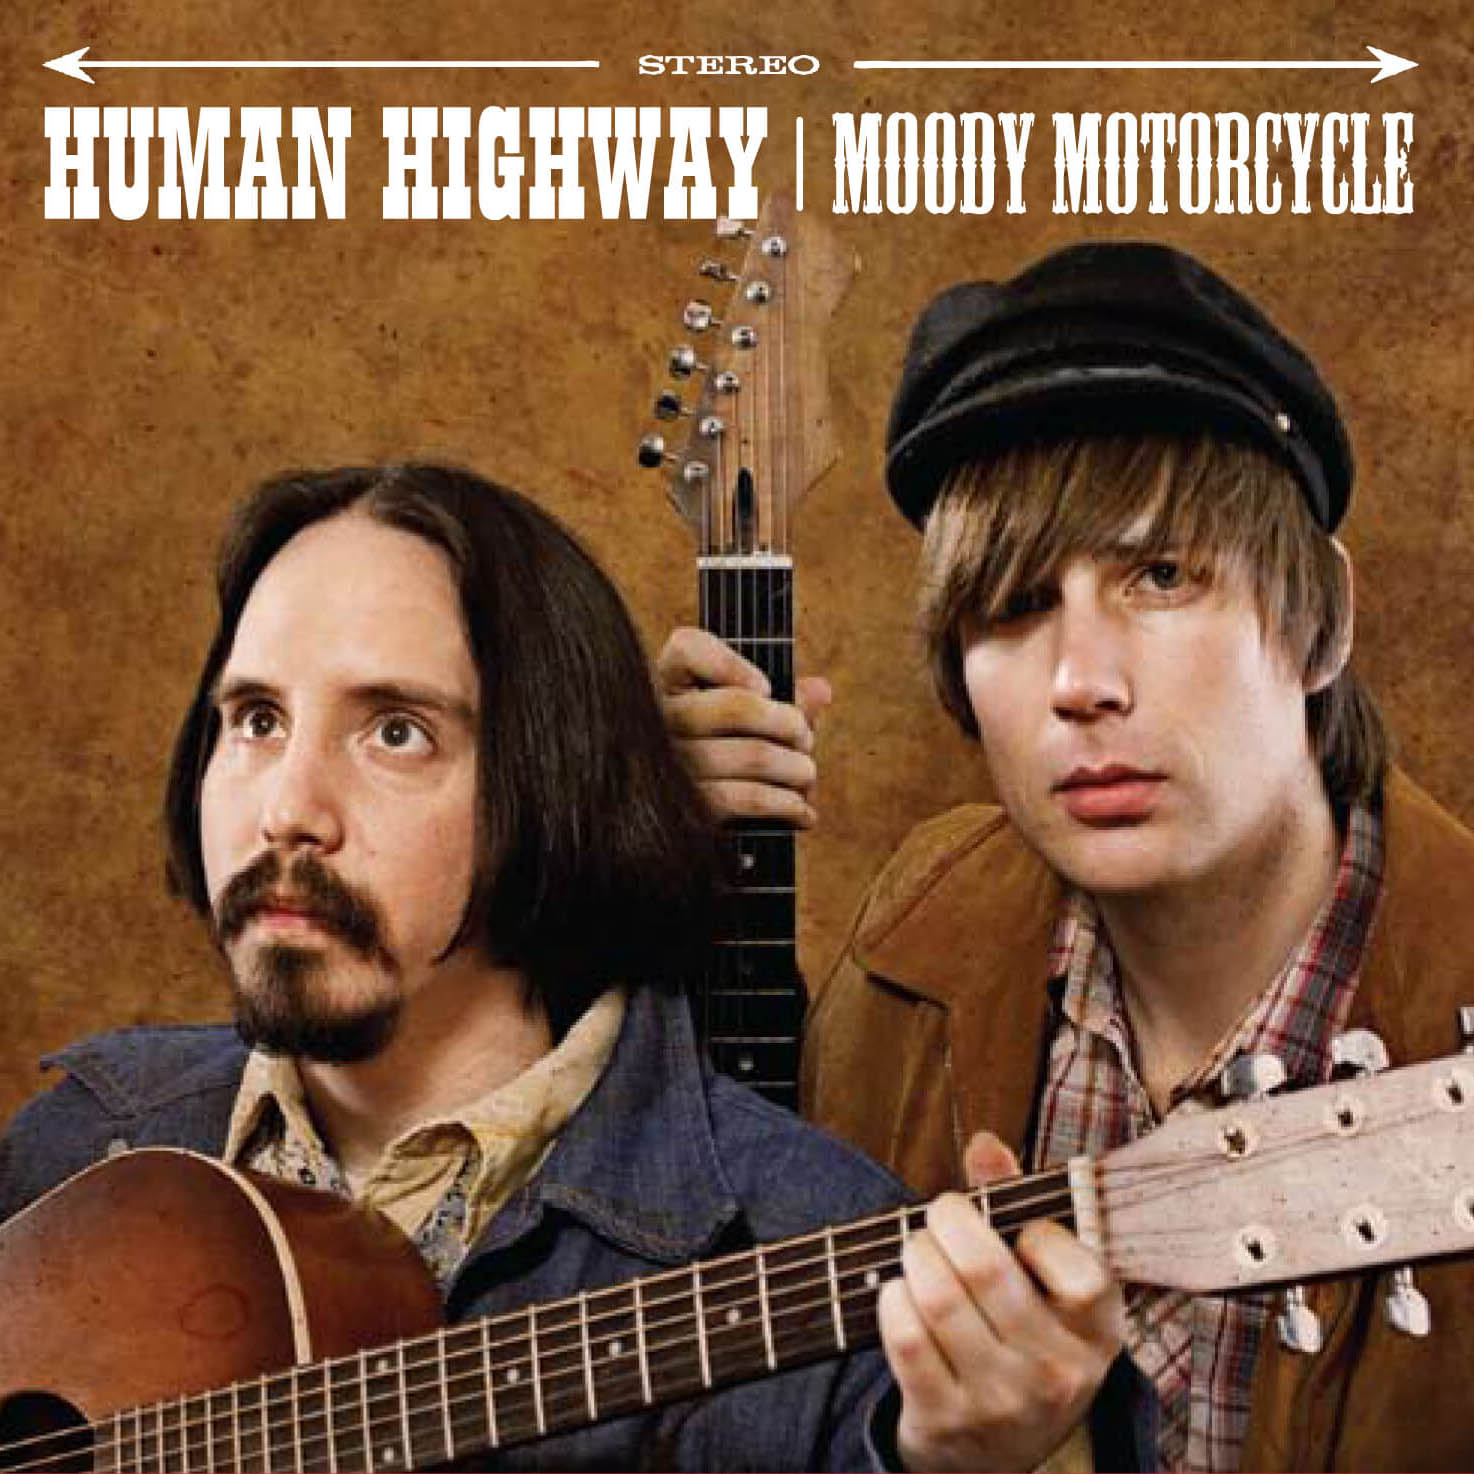 Human Highway, Moody Motorcycle